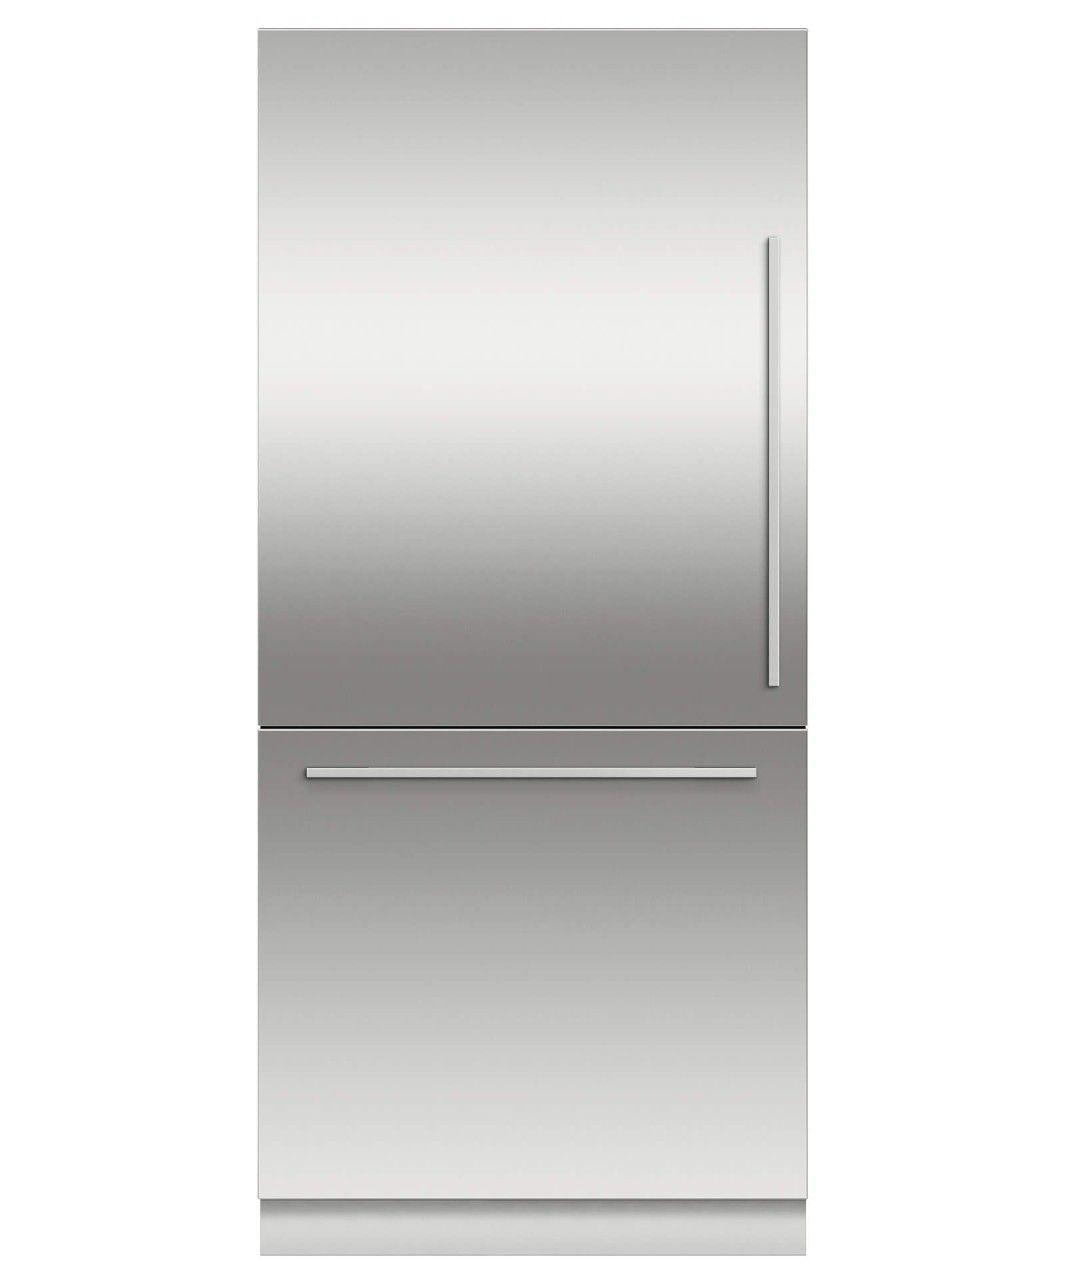 kitchenaid bottom freezer refrigerator not making ice